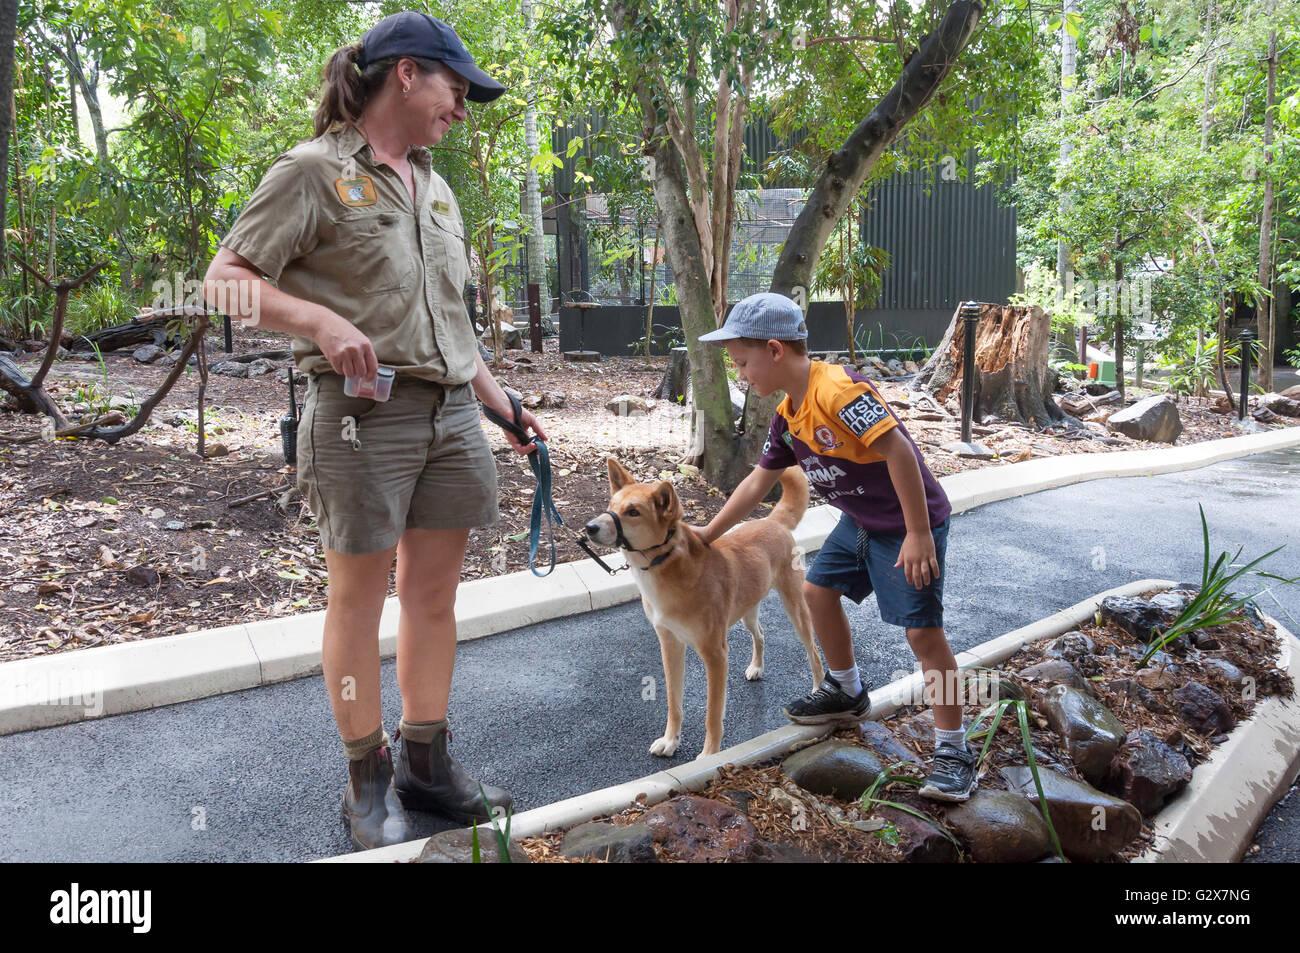 Park guide with Australian Dingo at Lone Pine Koala Sanctuary, Fig Tree Pocket, Brisbane, Queensland, Australia - Stock Image